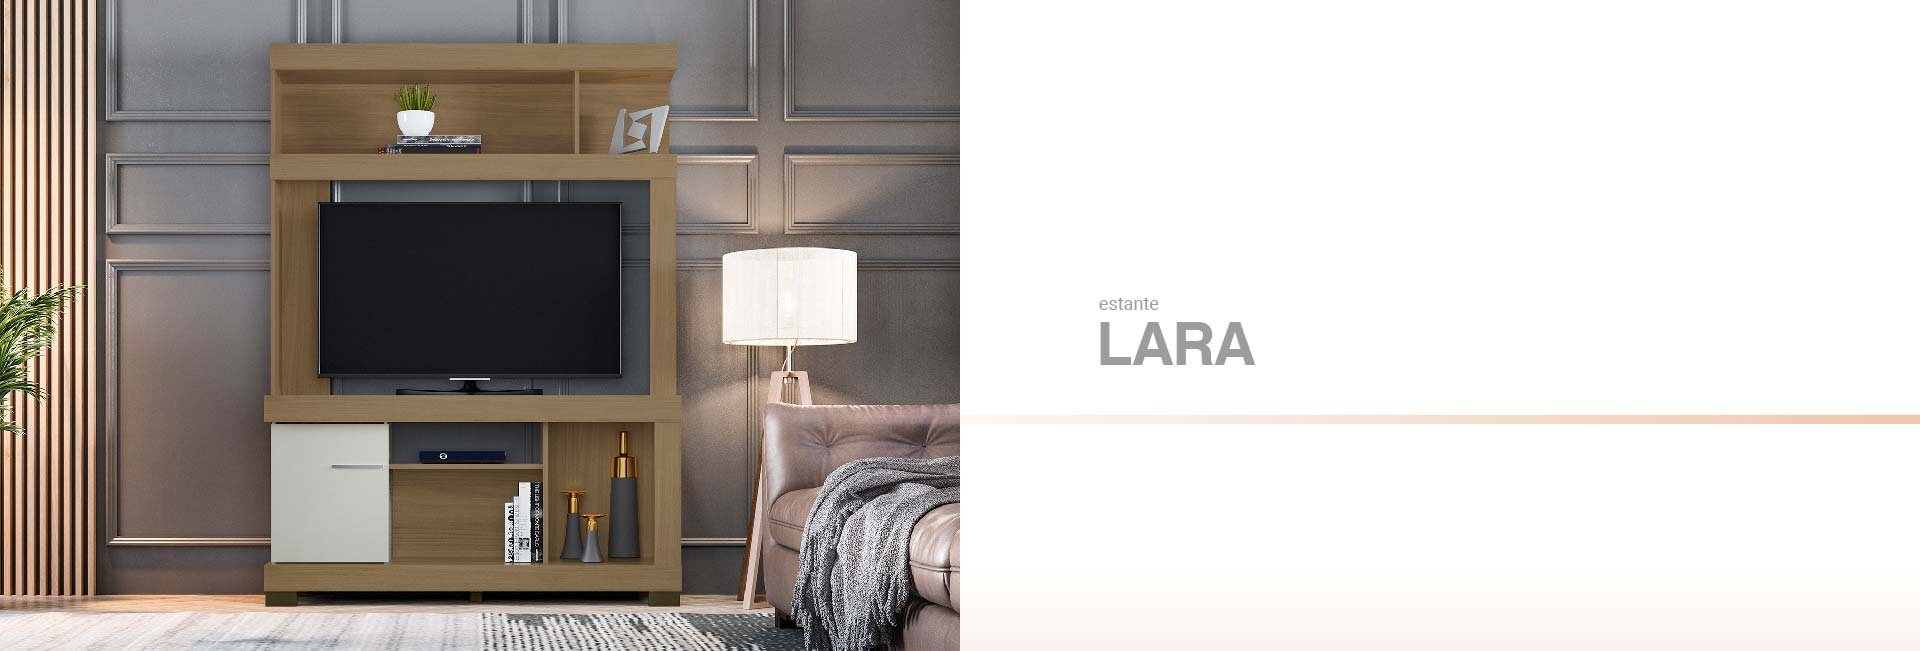 Centro de entretenimento Lara